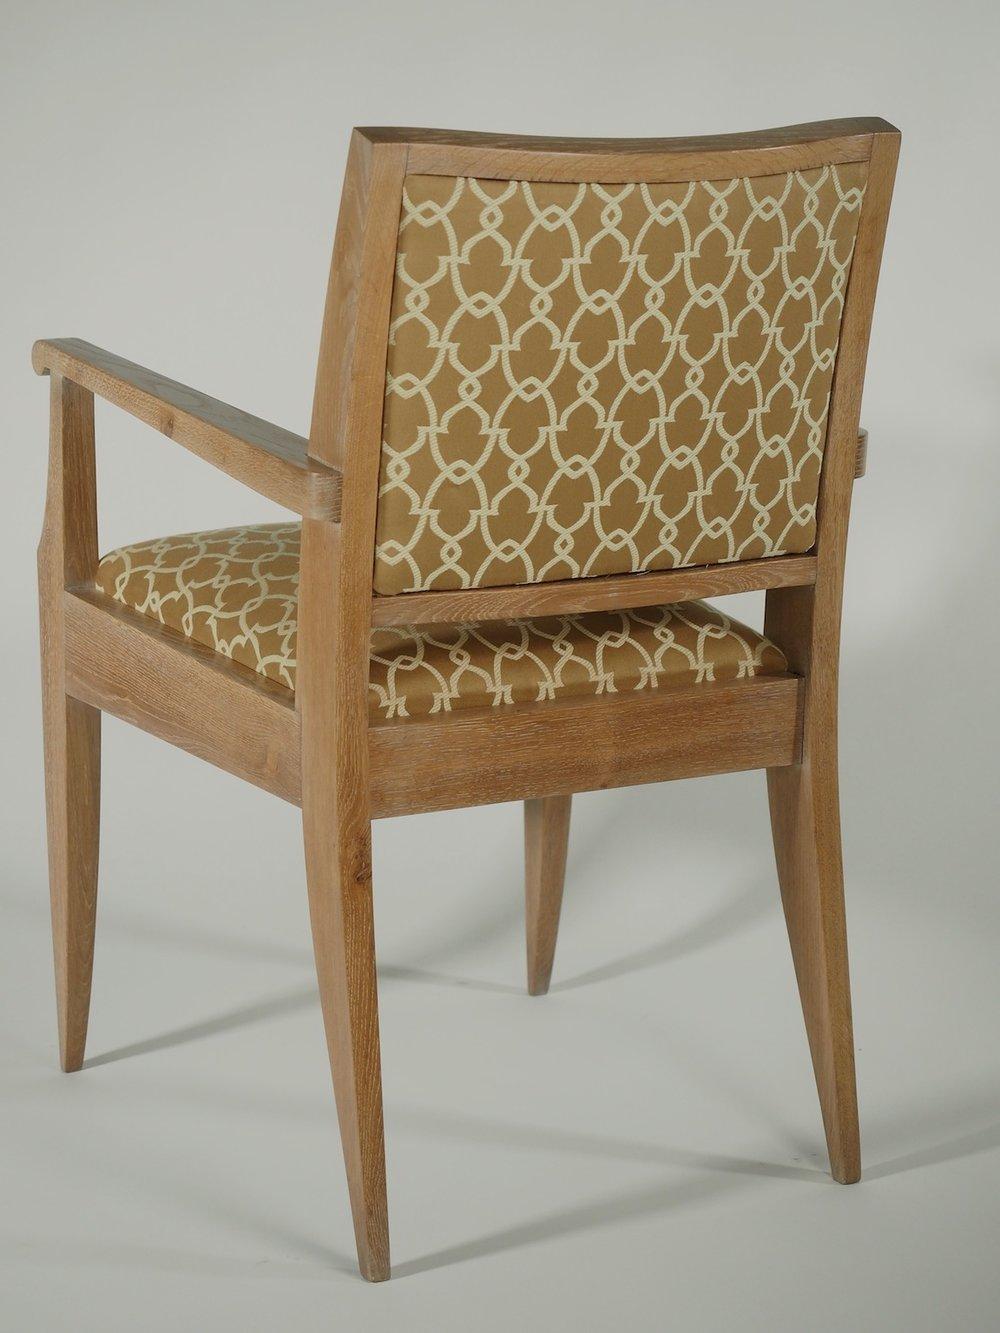 Dominique+pair+of+oak+armchairs+446.jpg